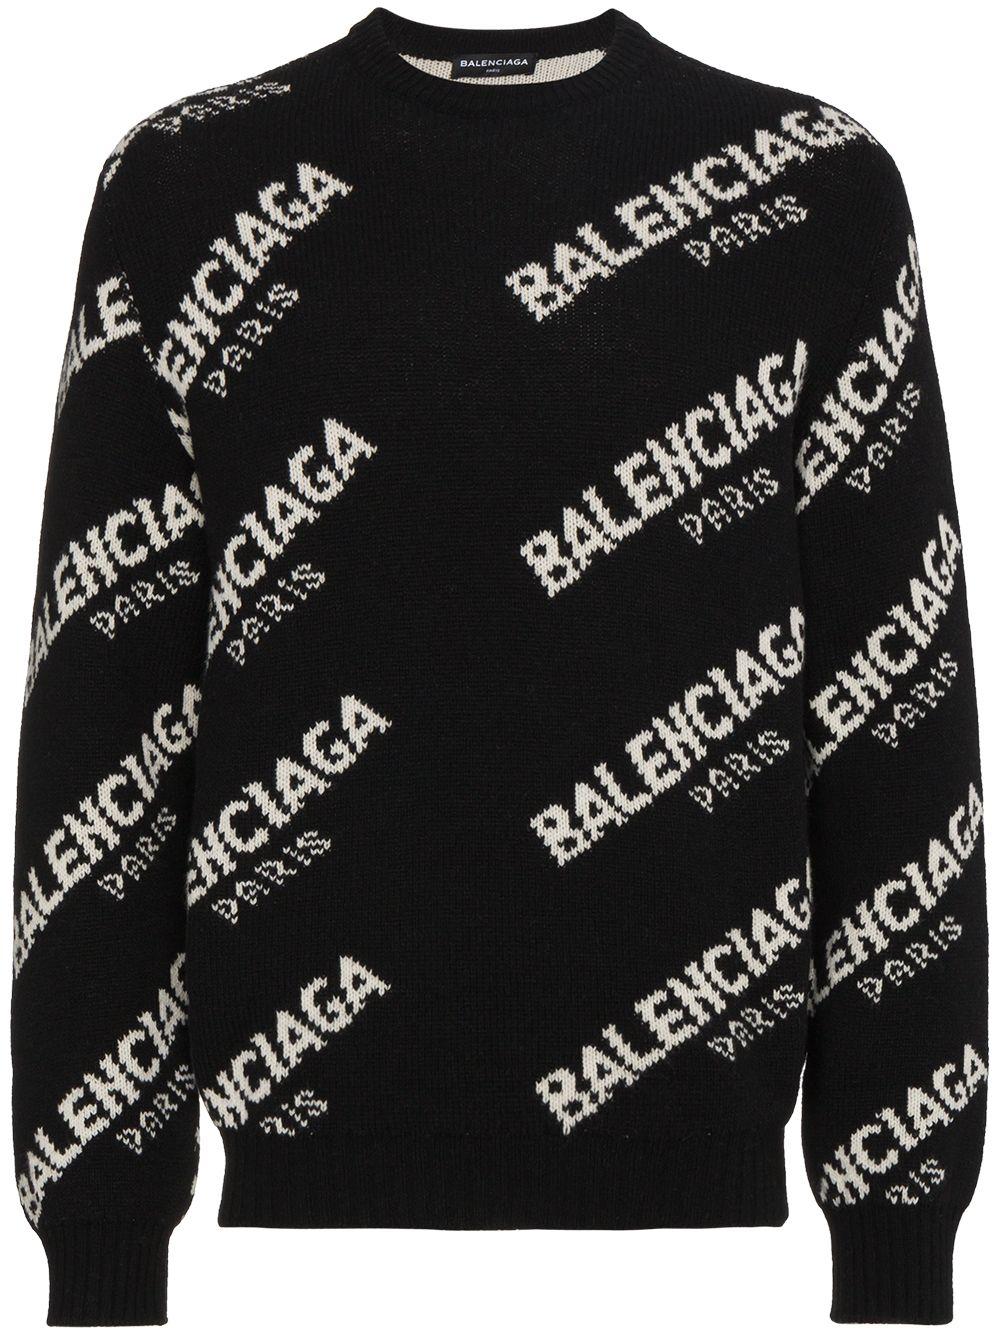 crewneck sweater in black wool and Balenciaga white logo BALENCIAGA |  | 507287-T14421070